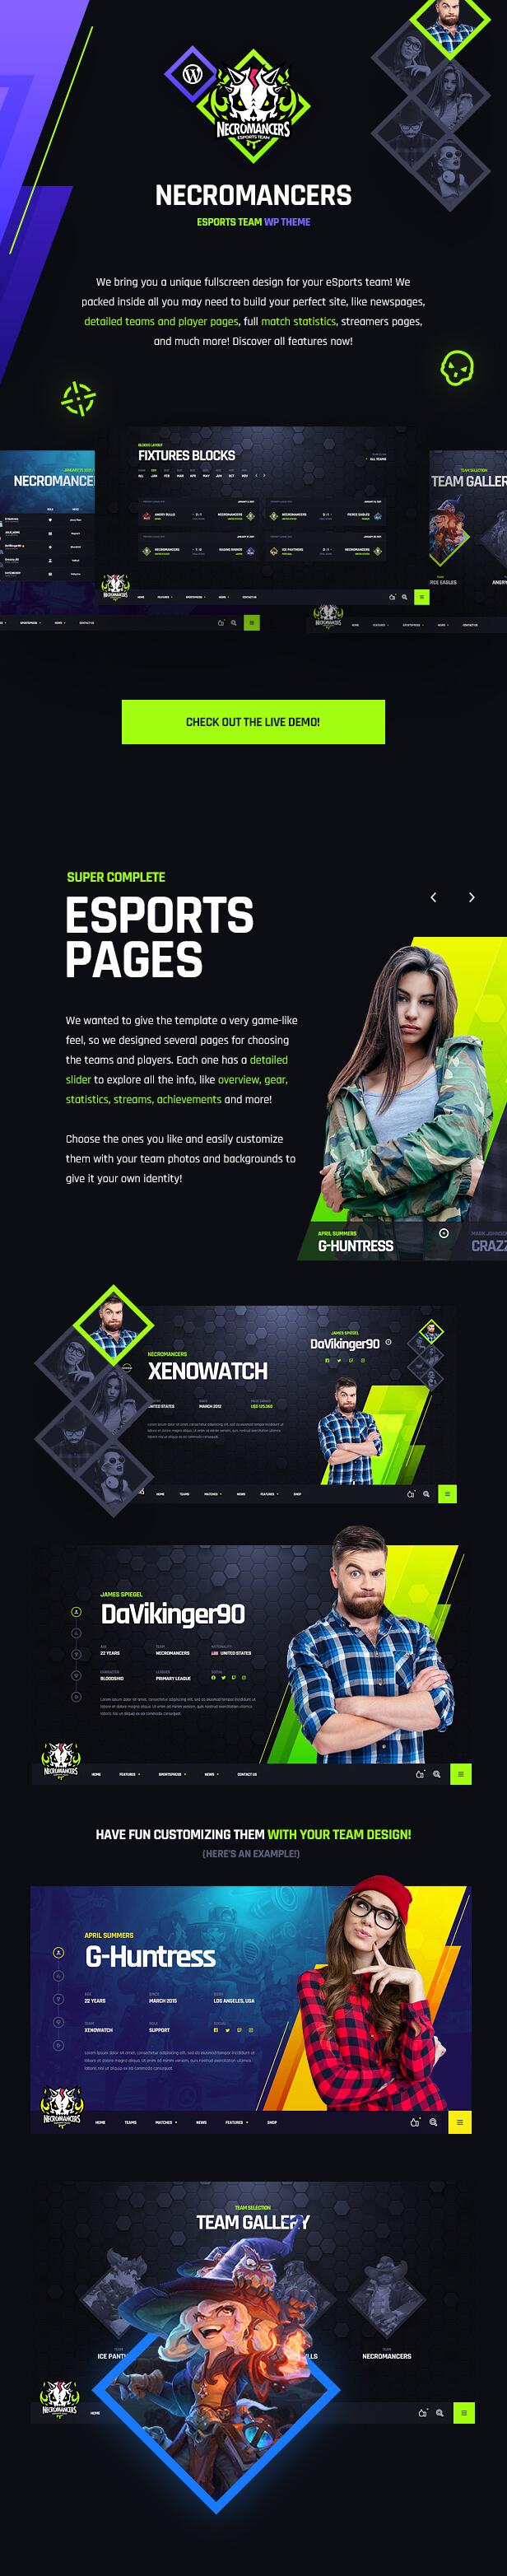 Necromancers - eSports & Gaming Team WordPress Theme - Overview